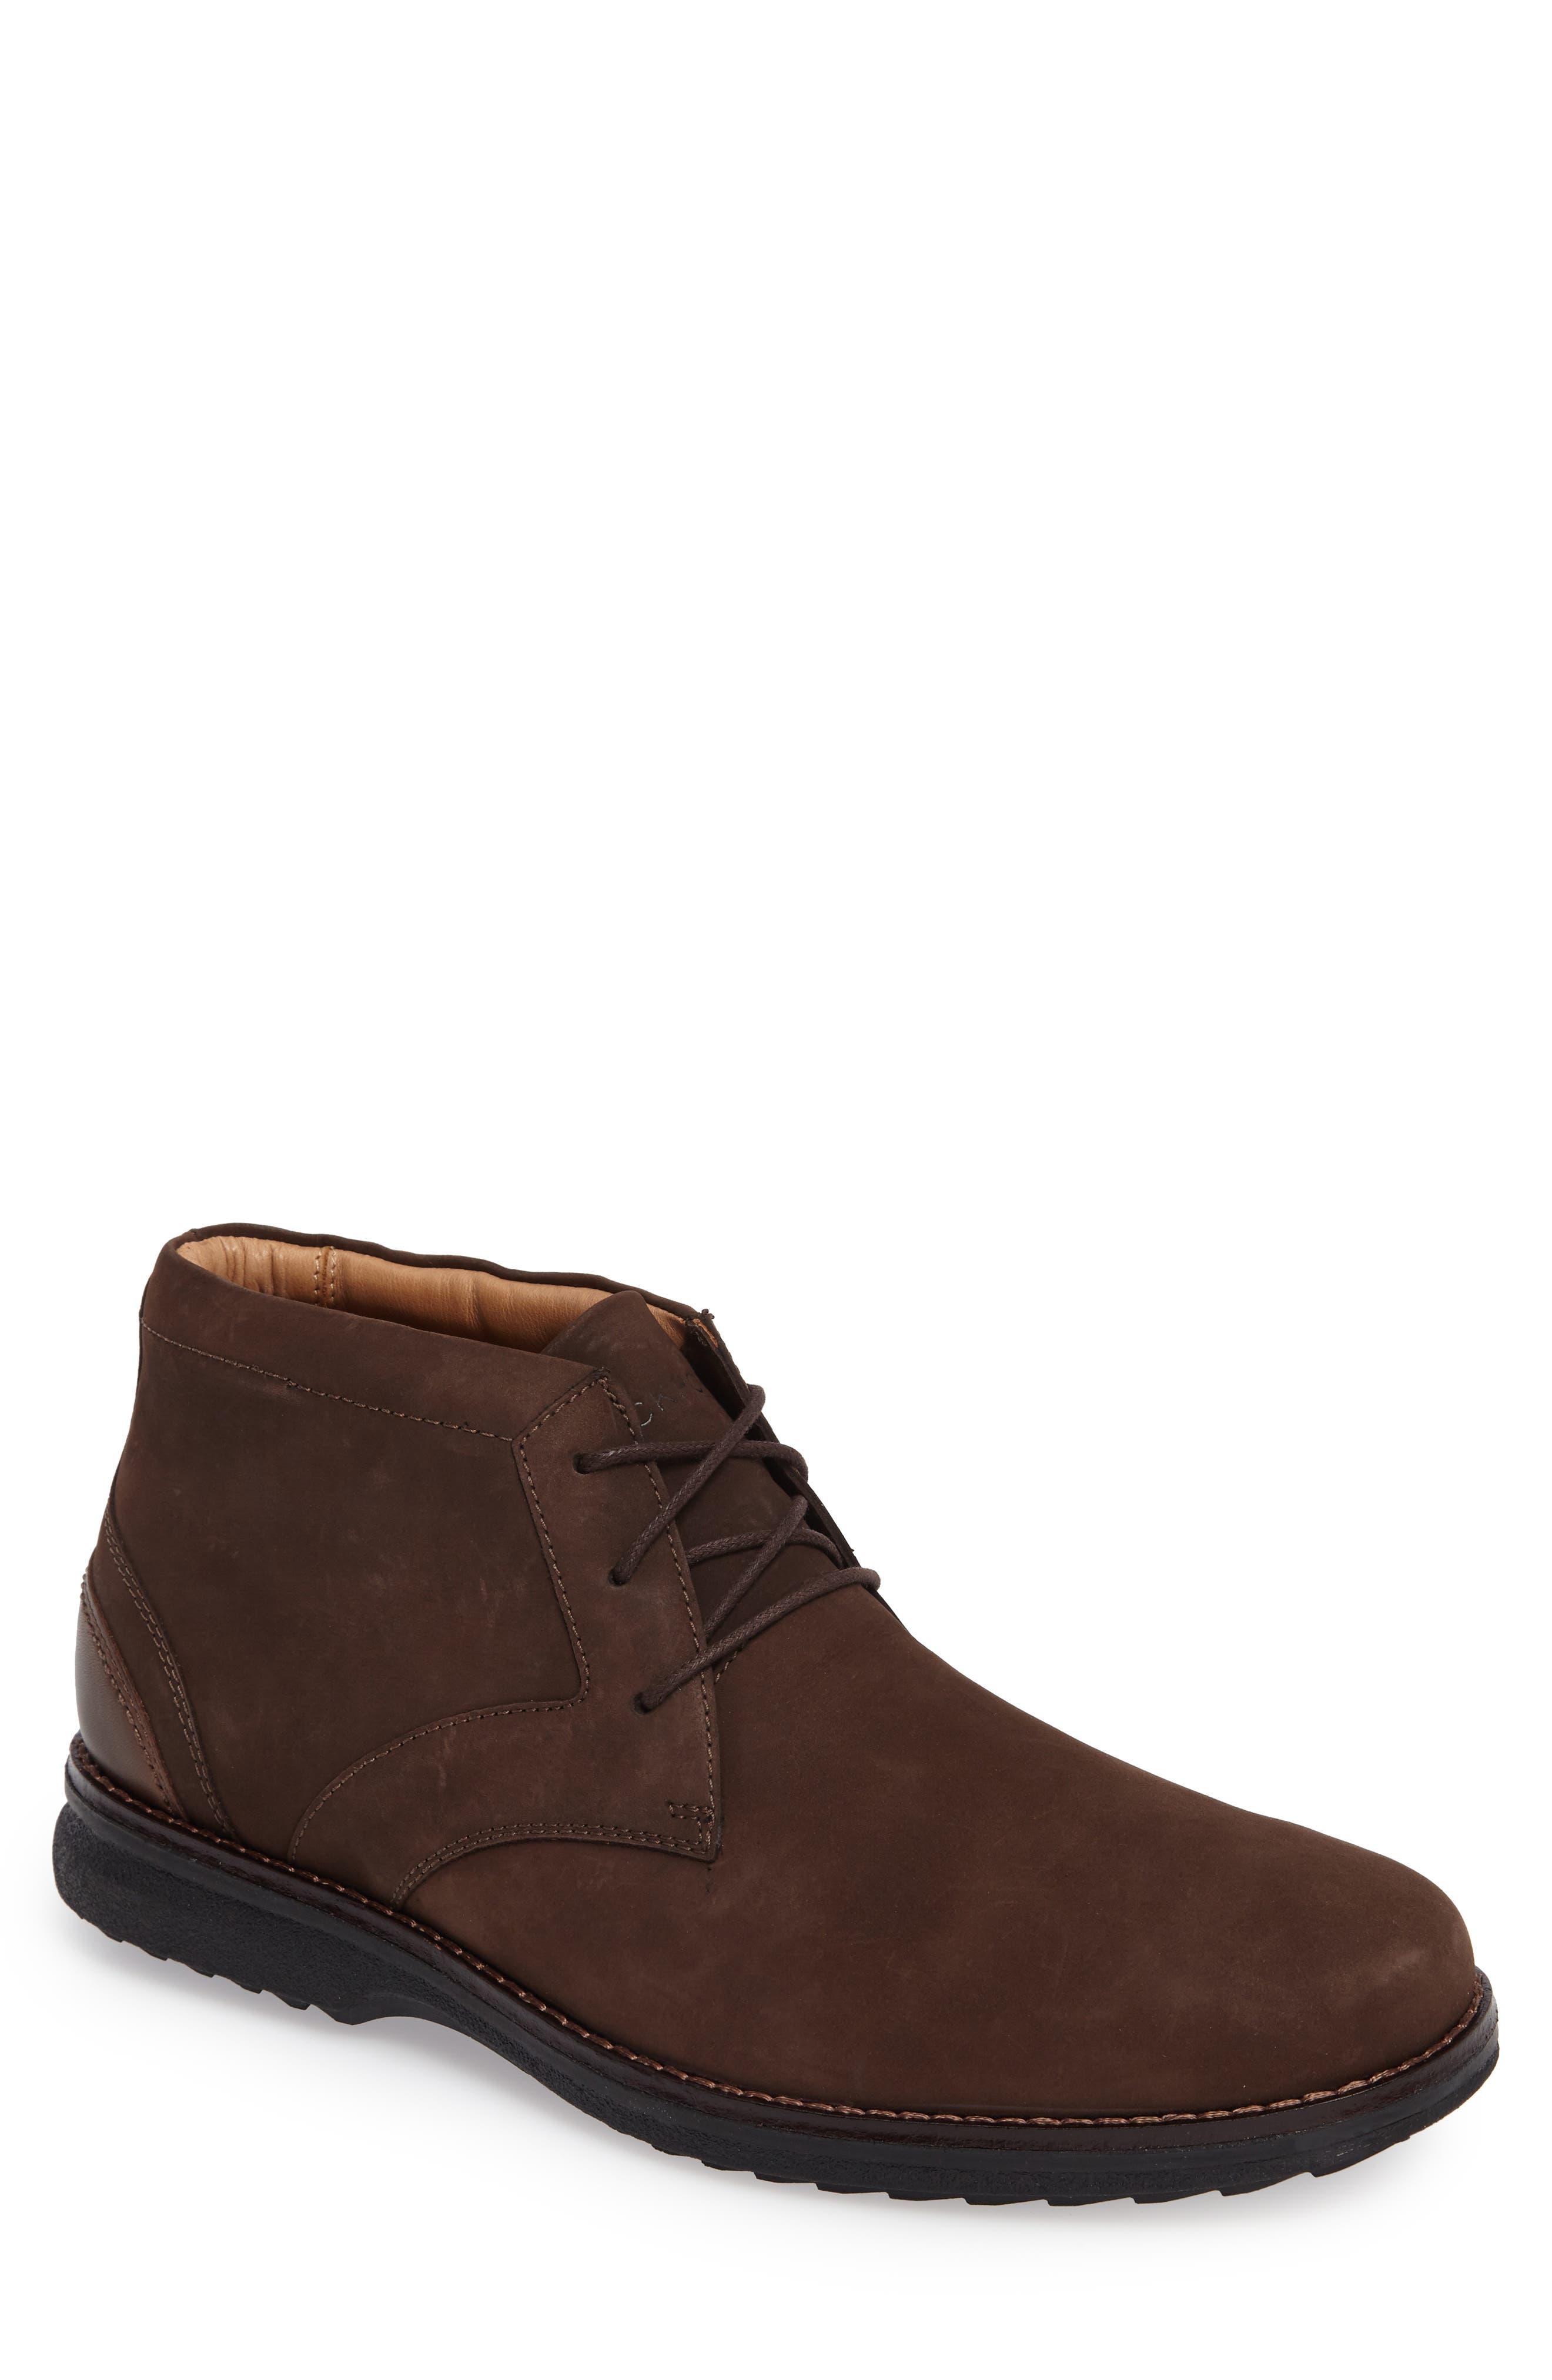 Premium Class Chukka Boot,                         Main,                         color, Brown Nubuck